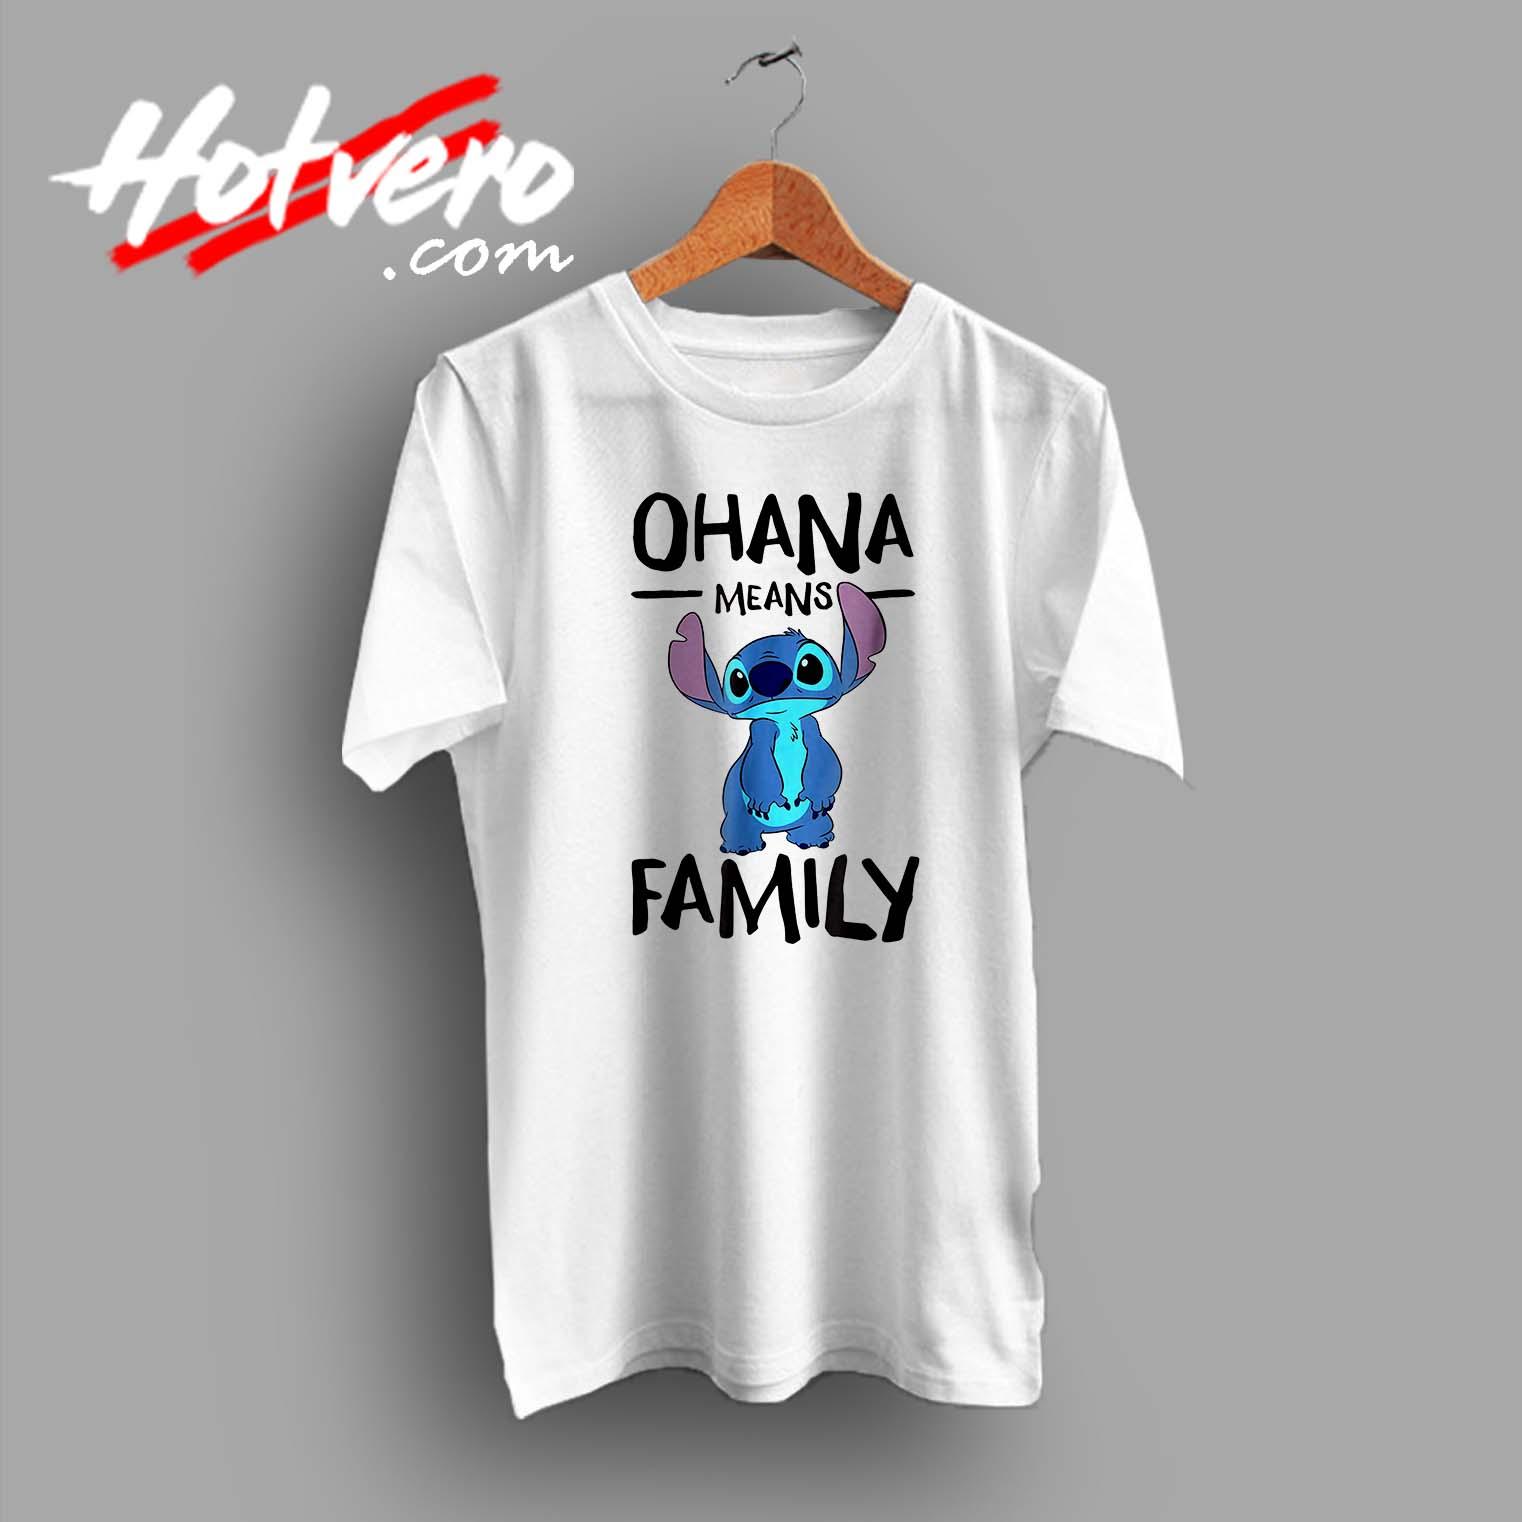 7b0530fe Lillo Stitch Ohana Means Family Custom T Shirt - Hotvero